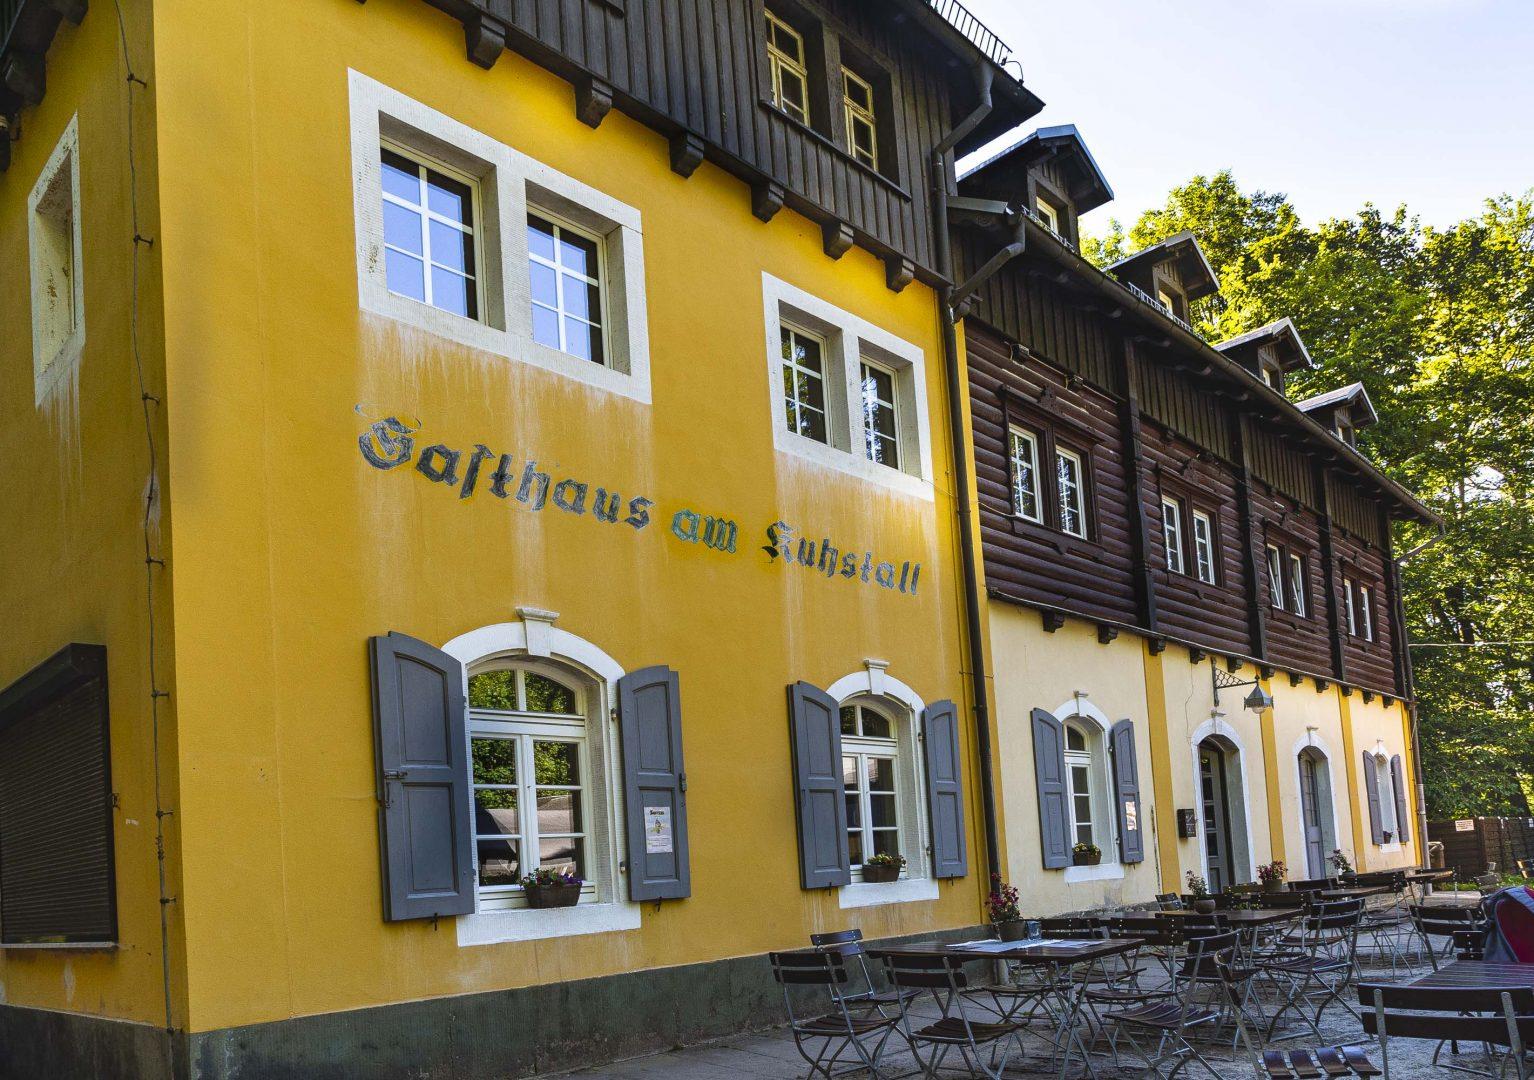 Gasthaus zum Kuhstall